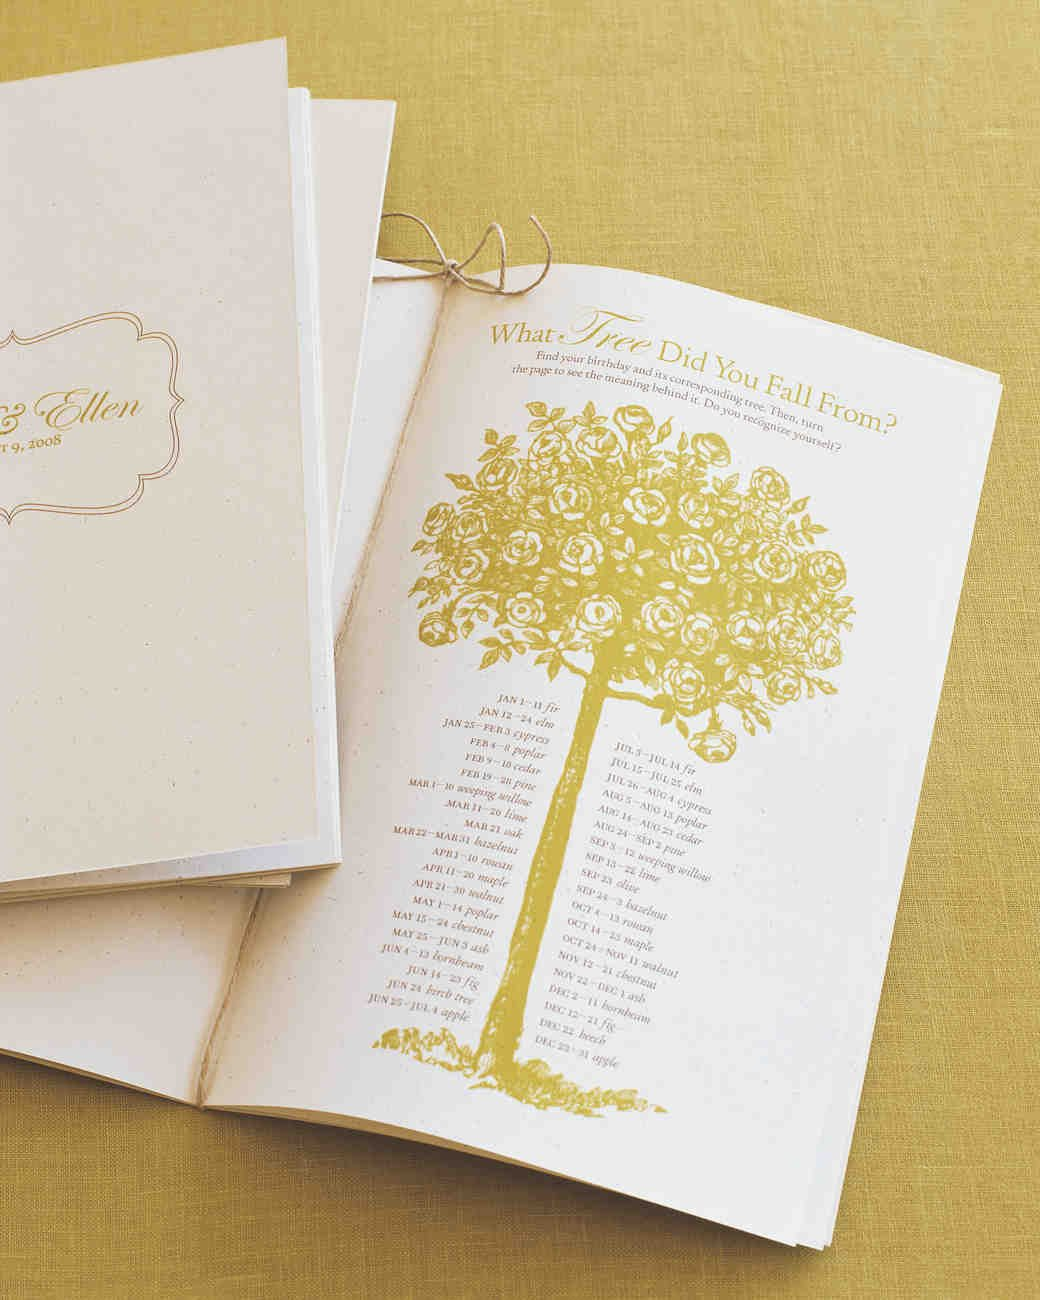 Diy Wedding Program Template 25 Ways to Upgrade Your Diy Wedding Programs